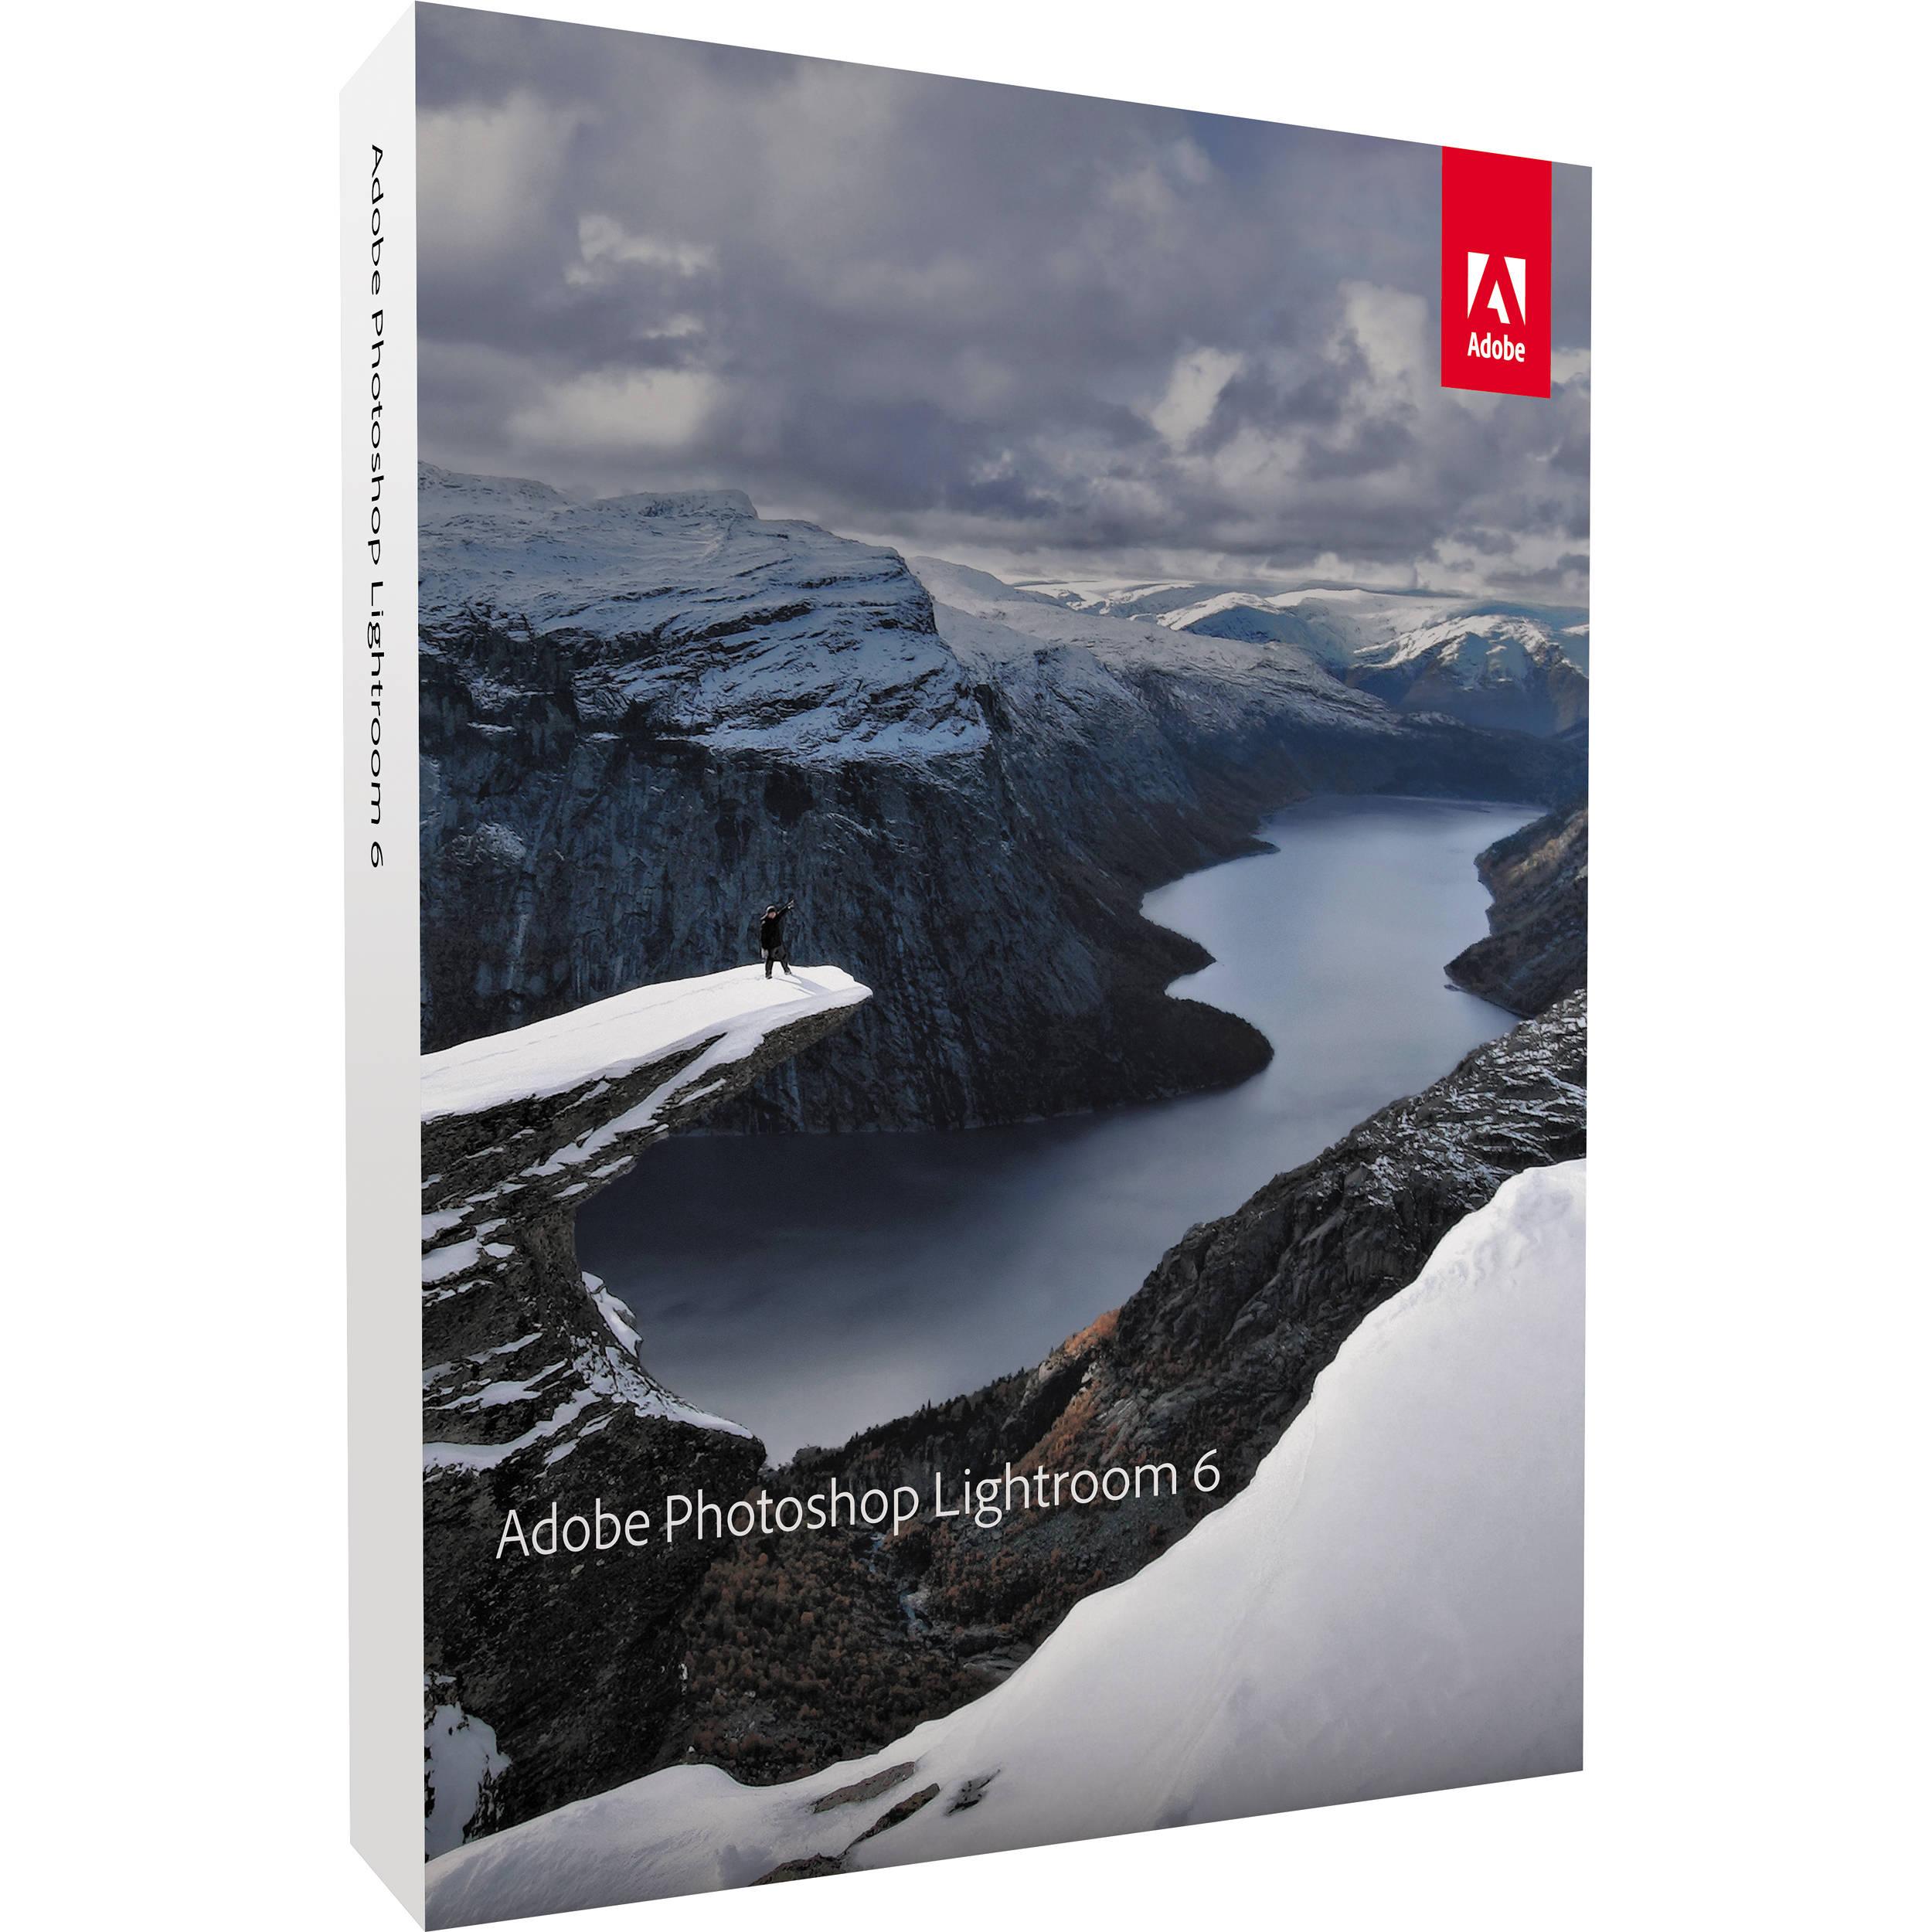 Adobe Photoshop Lightroom 6 (D...